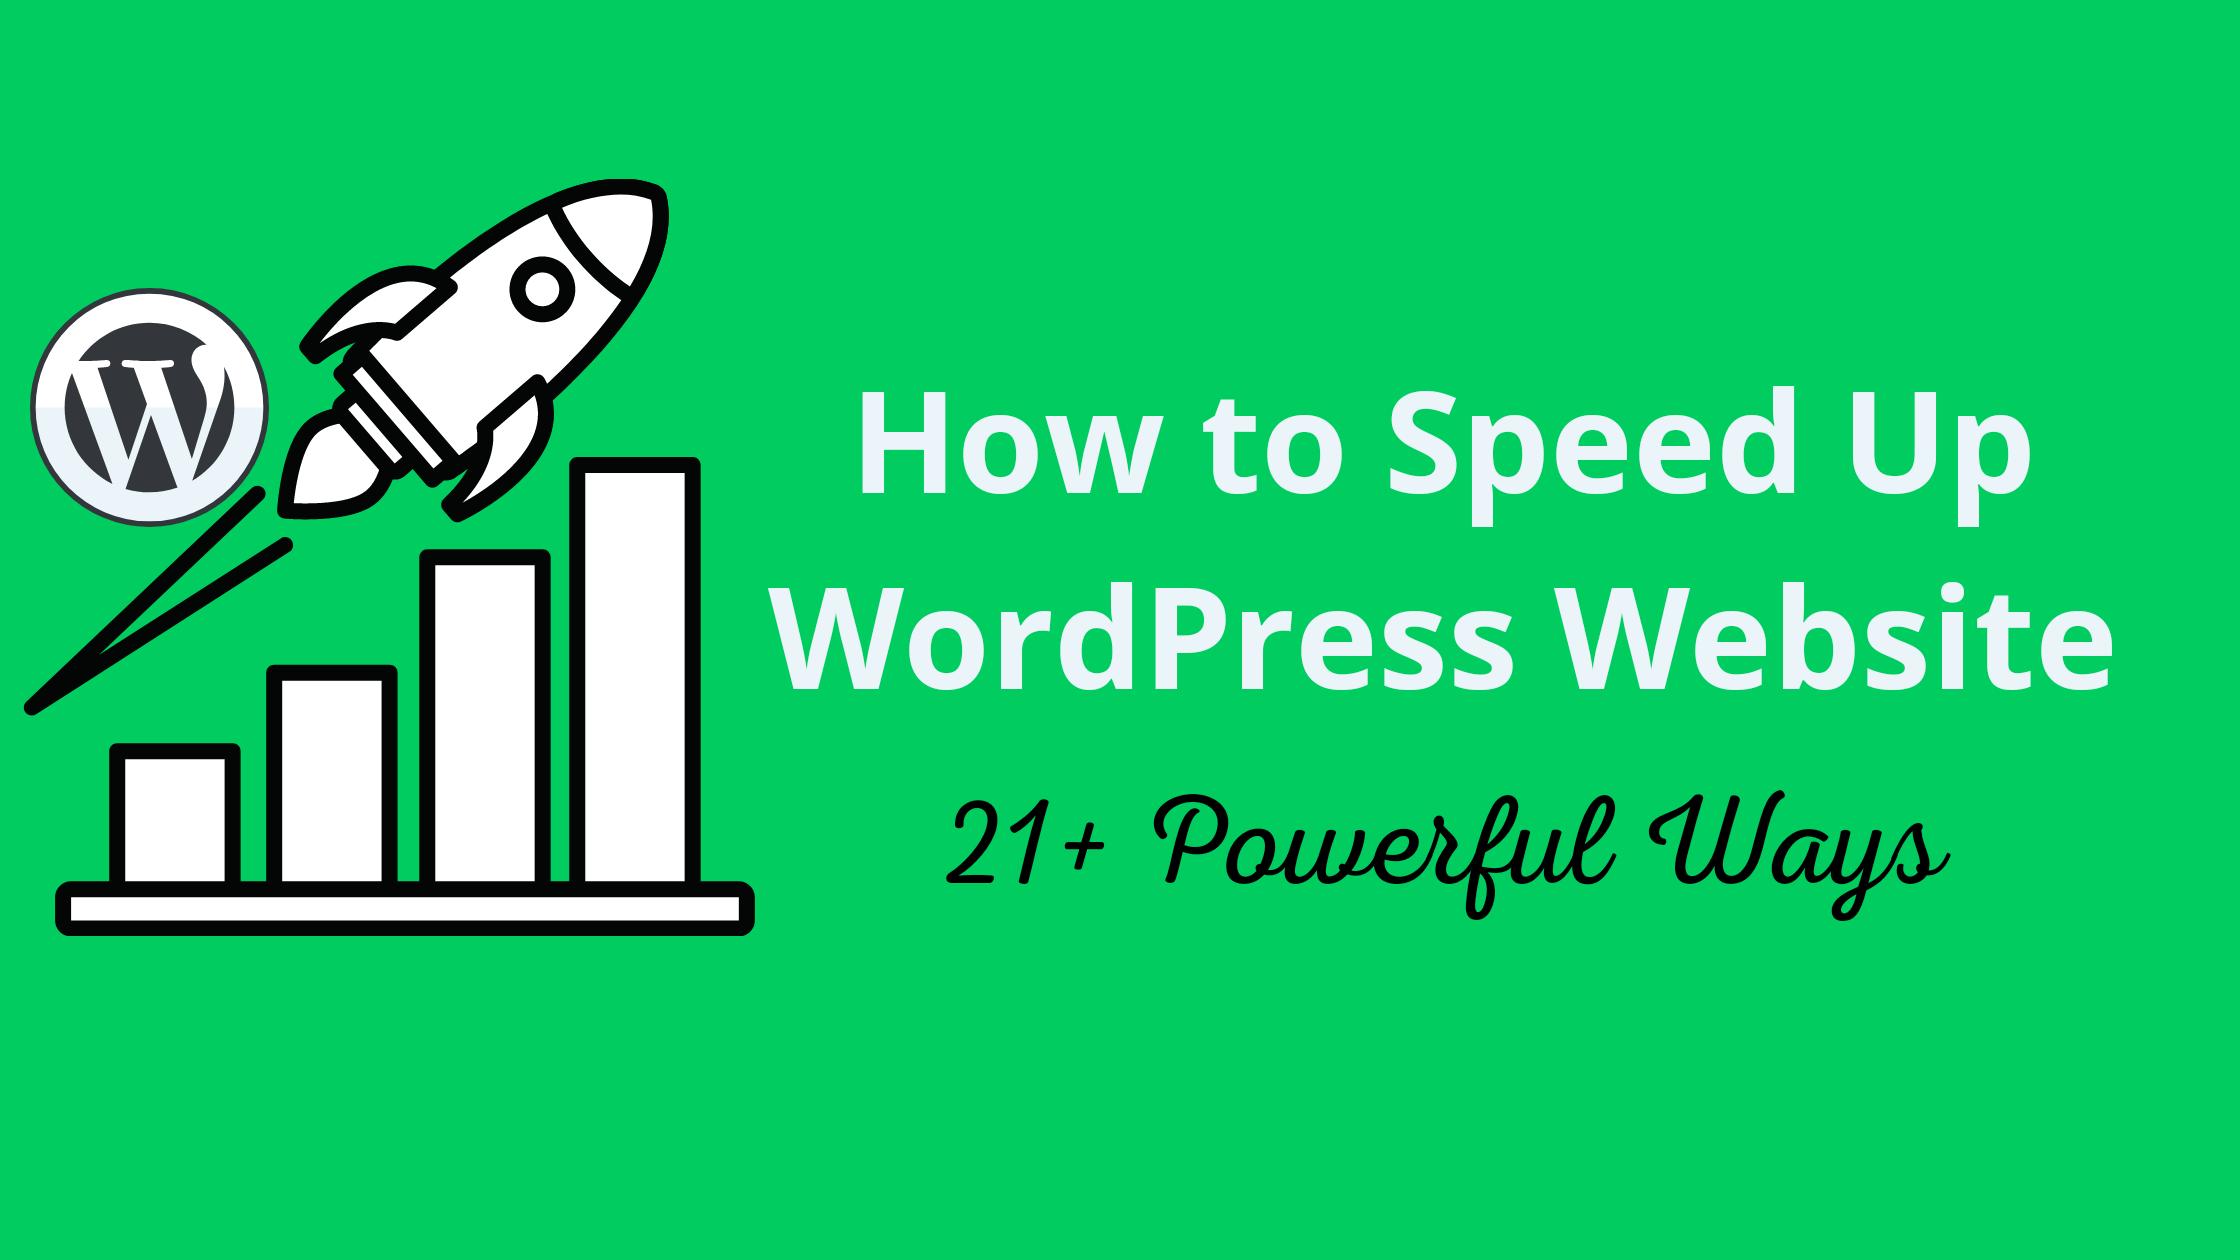 21 Ways to Speed Up WordPress Website